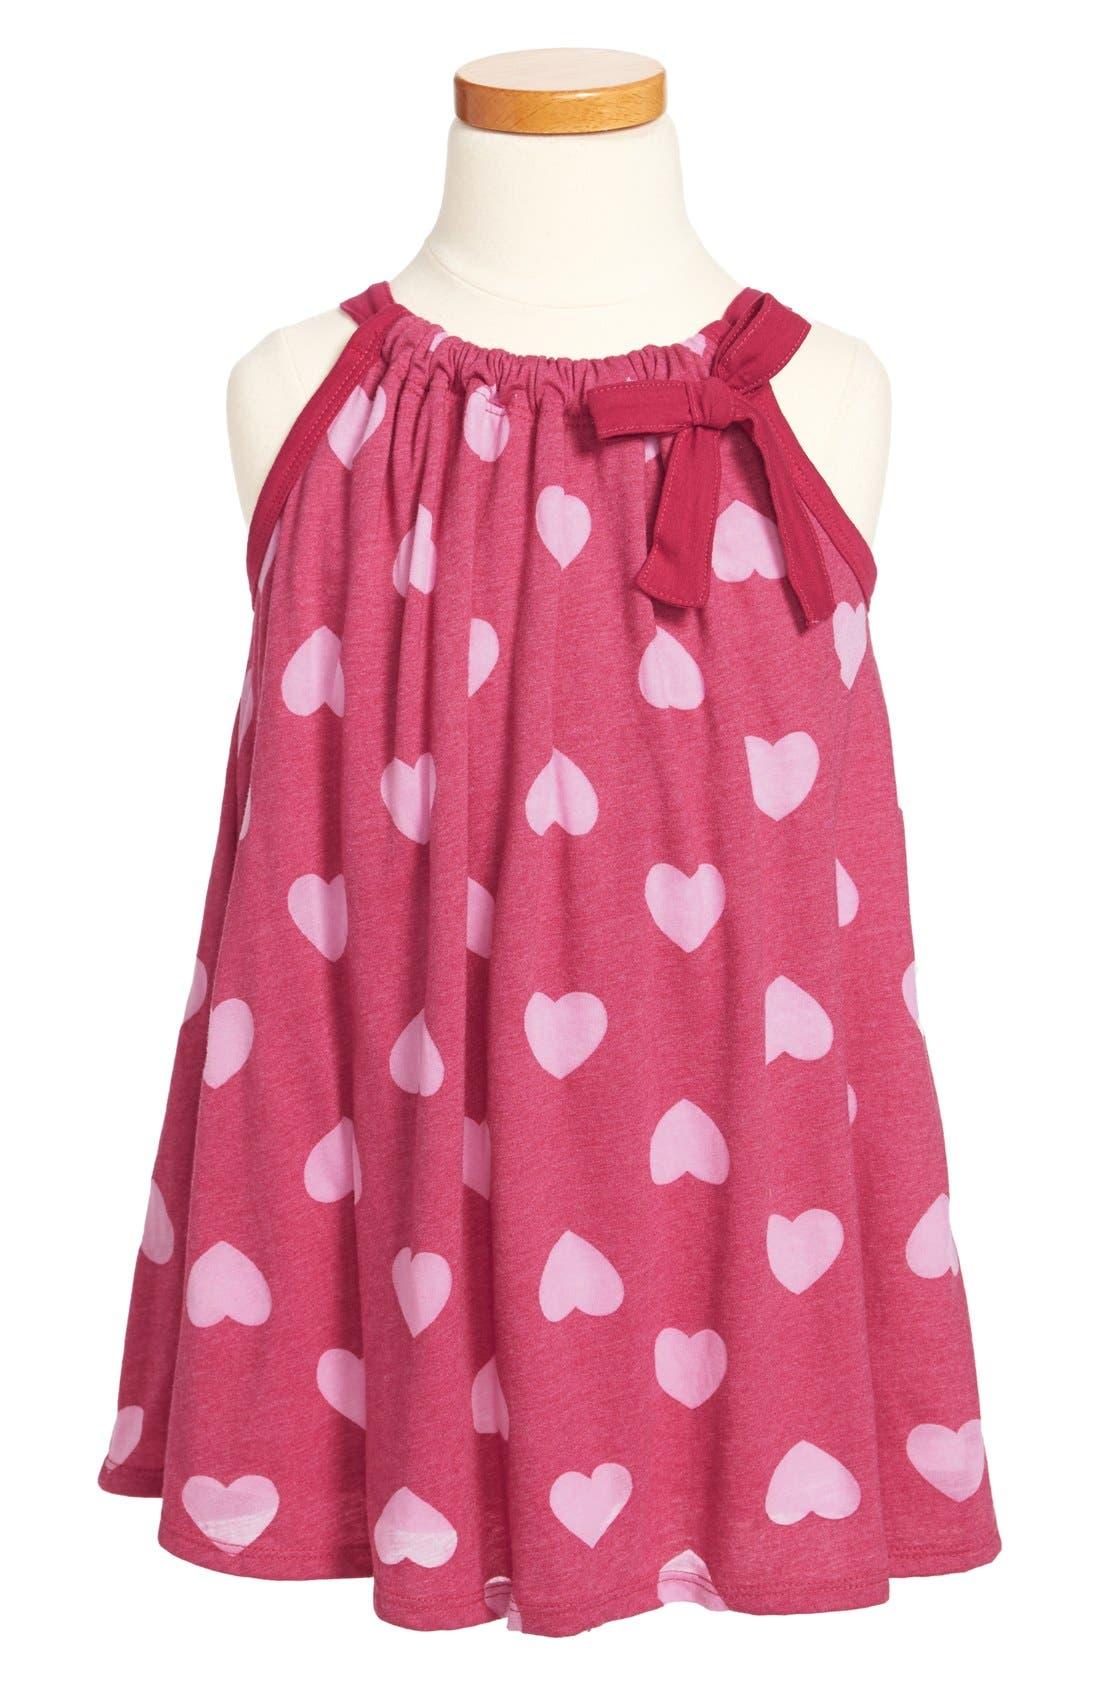 Main Image - Red Wagon Baby Print Dress (Little Girls)